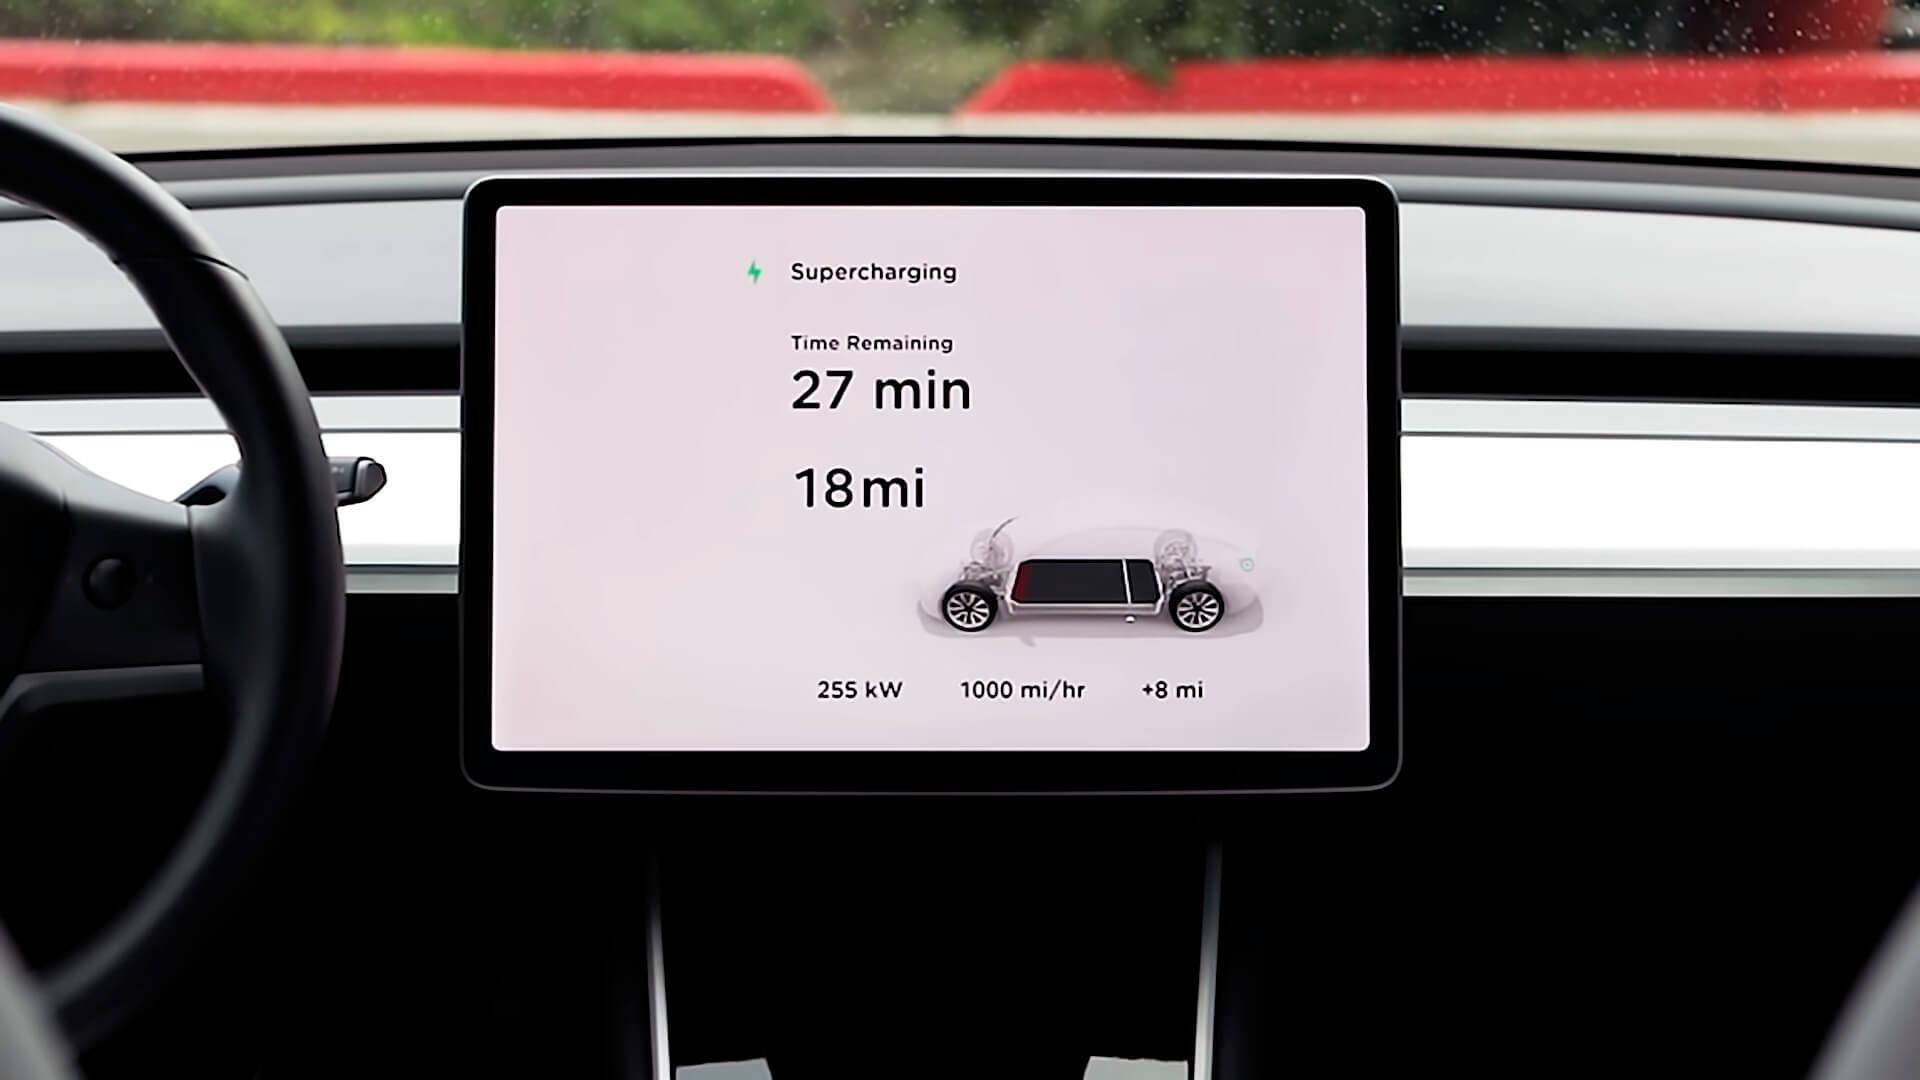 Supercharger V3 смогут вдва раза быстрее заряжать, чем Supercharger V2